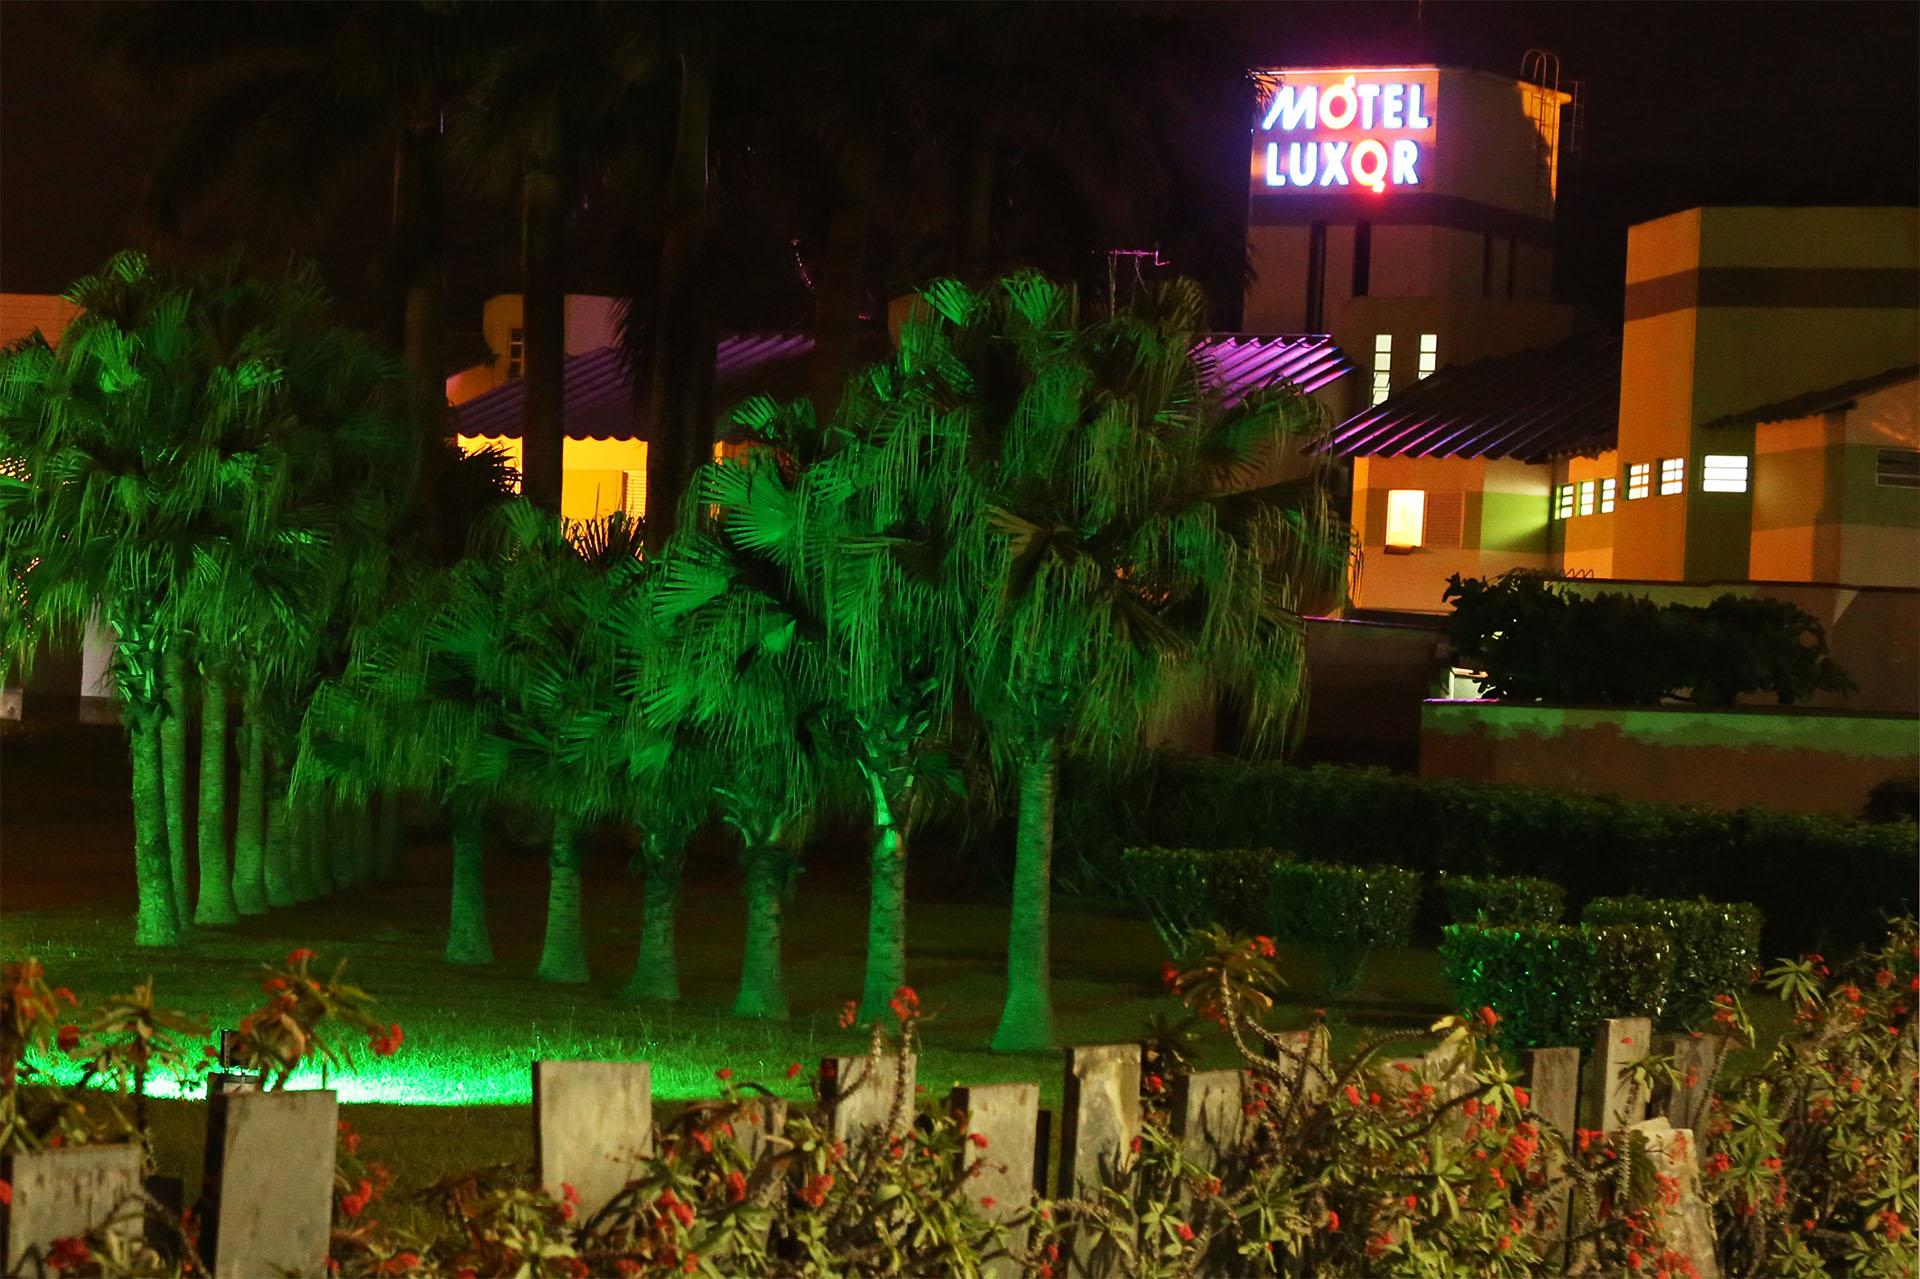 Motel Luxor